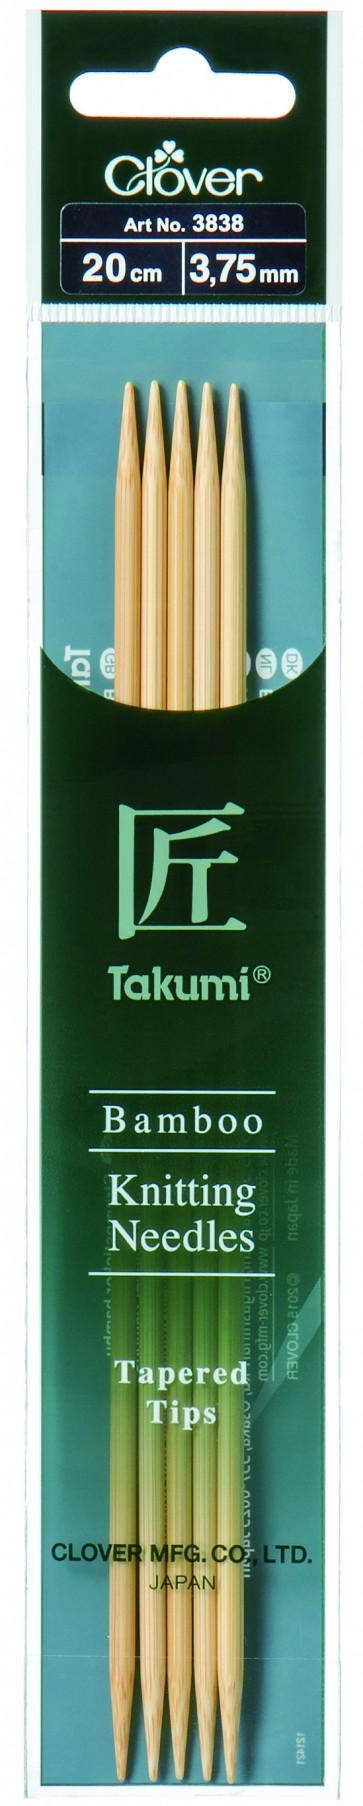 CLOVER Strumpfstrickndl Bambus Takumi 20cm/3.75mm